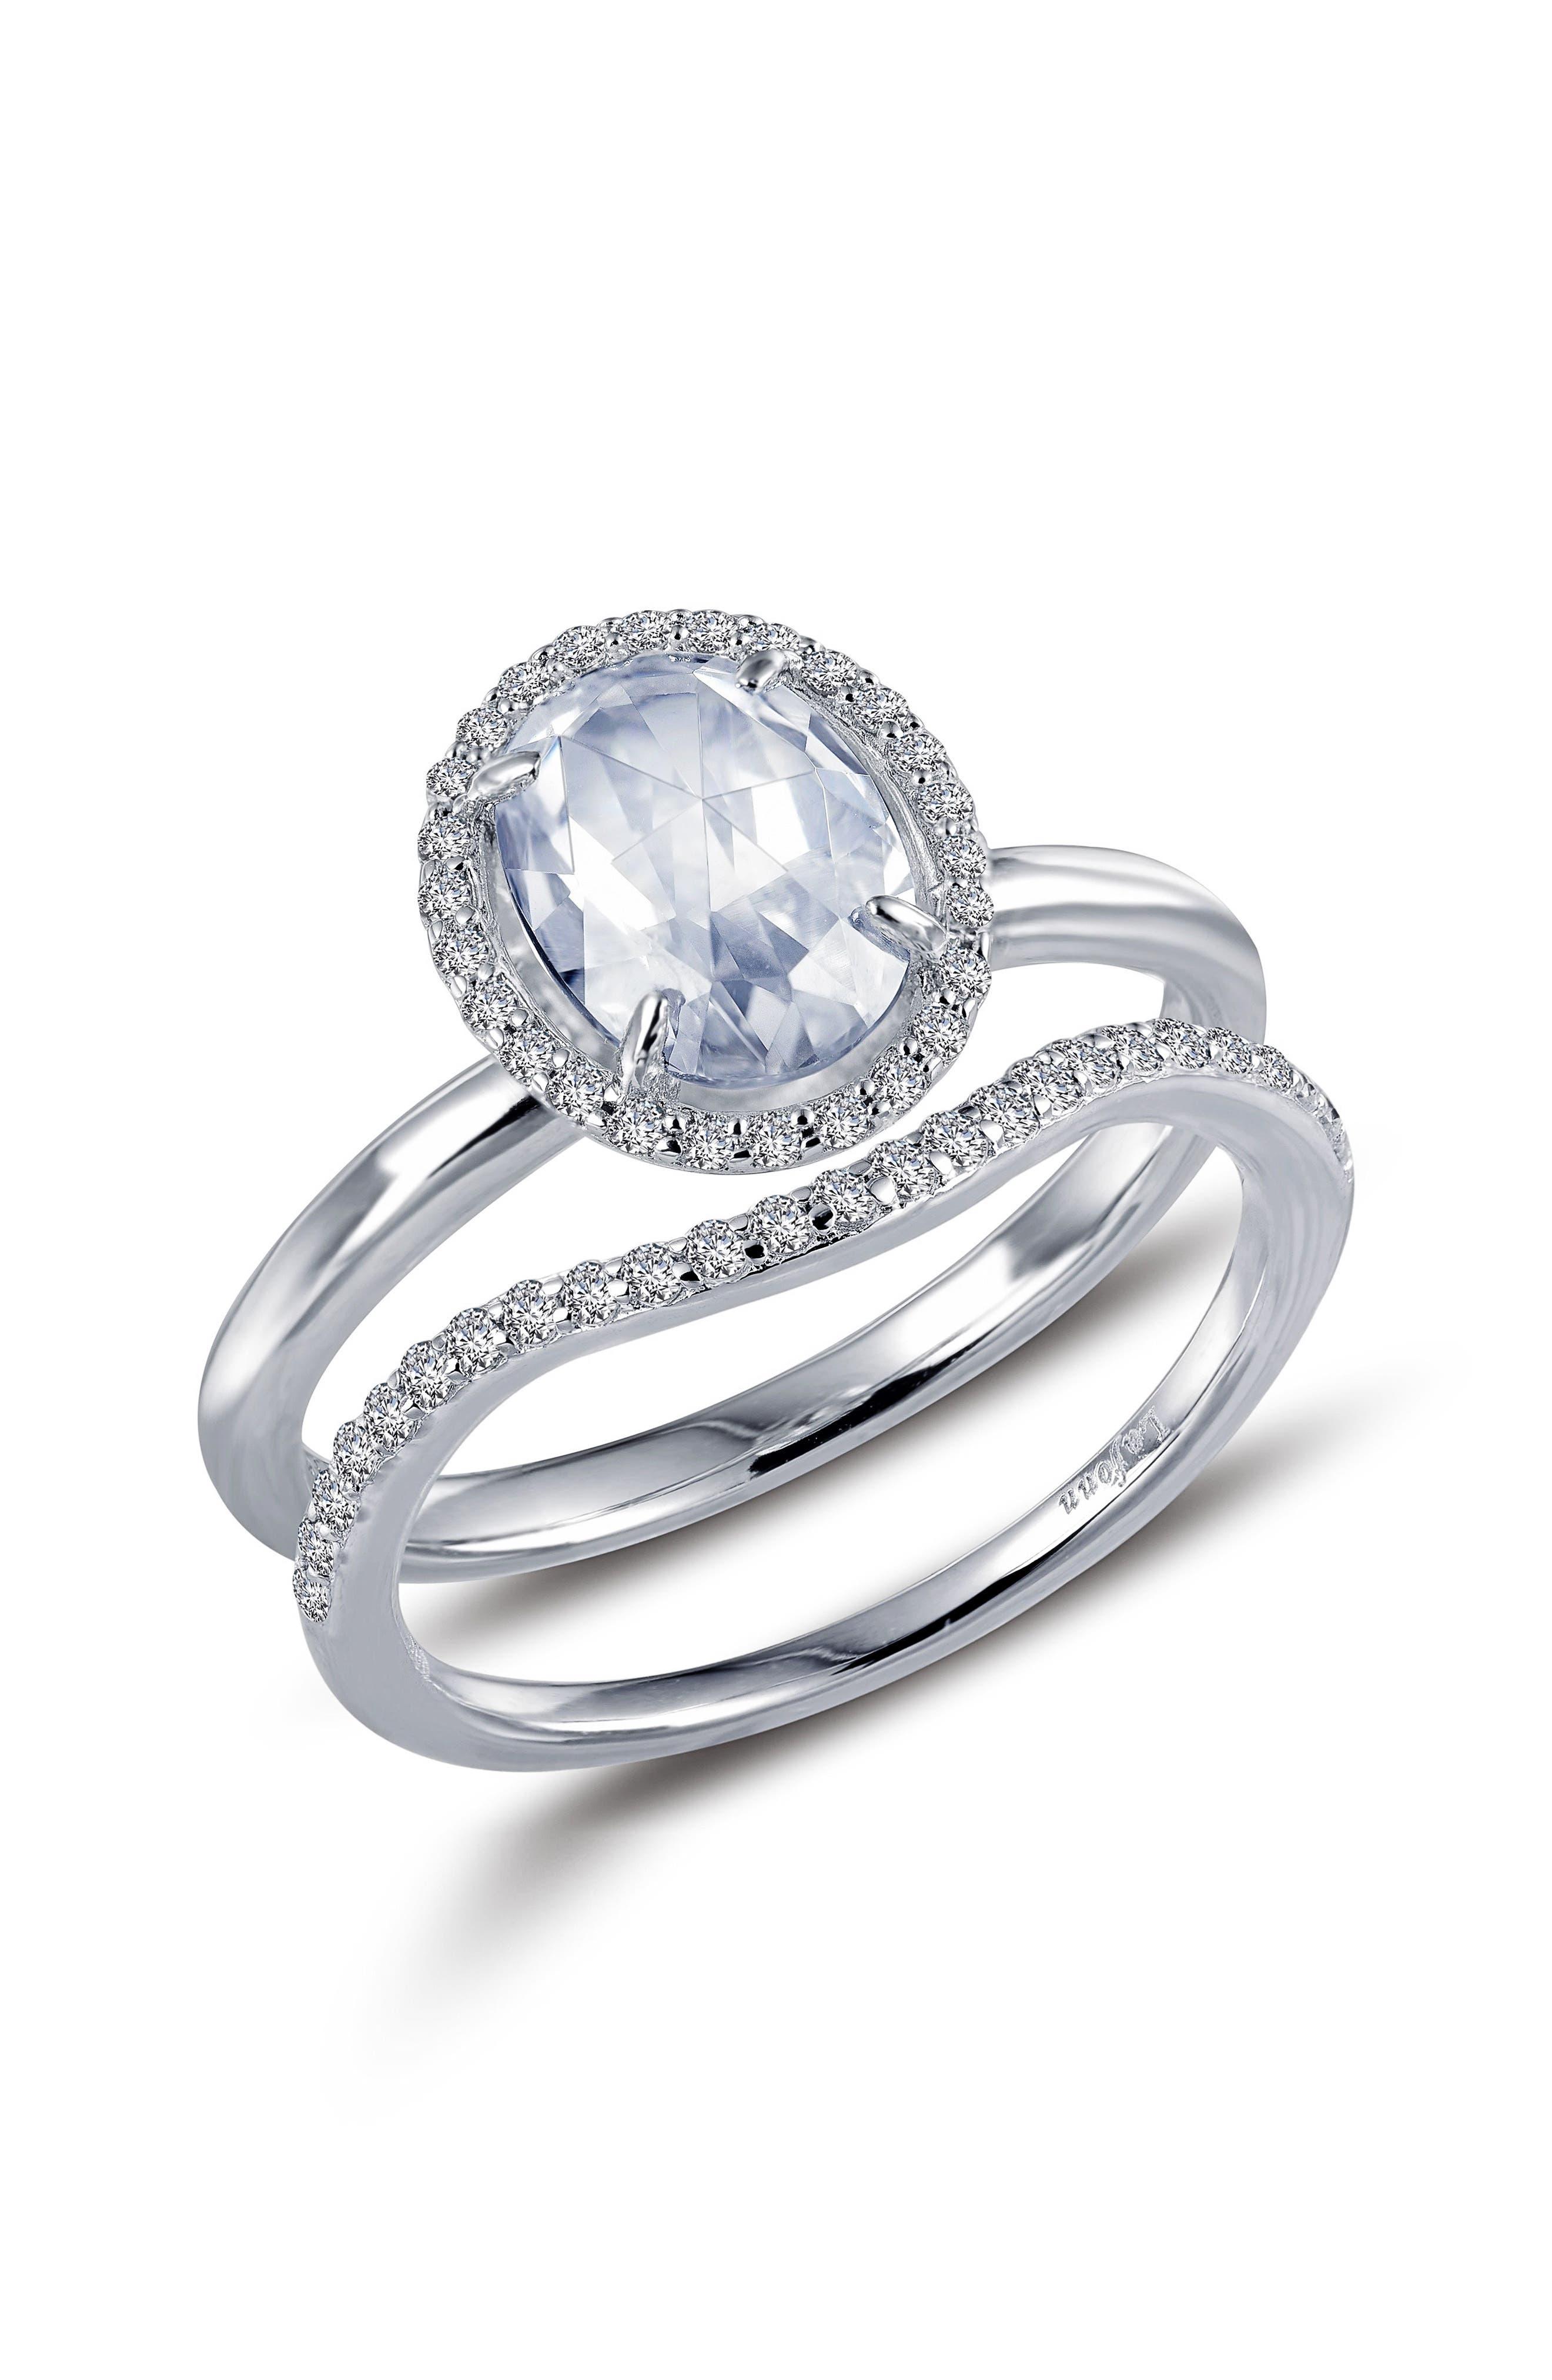 Rose Cut Simulated Diamond Ring,                         Main,                         color,